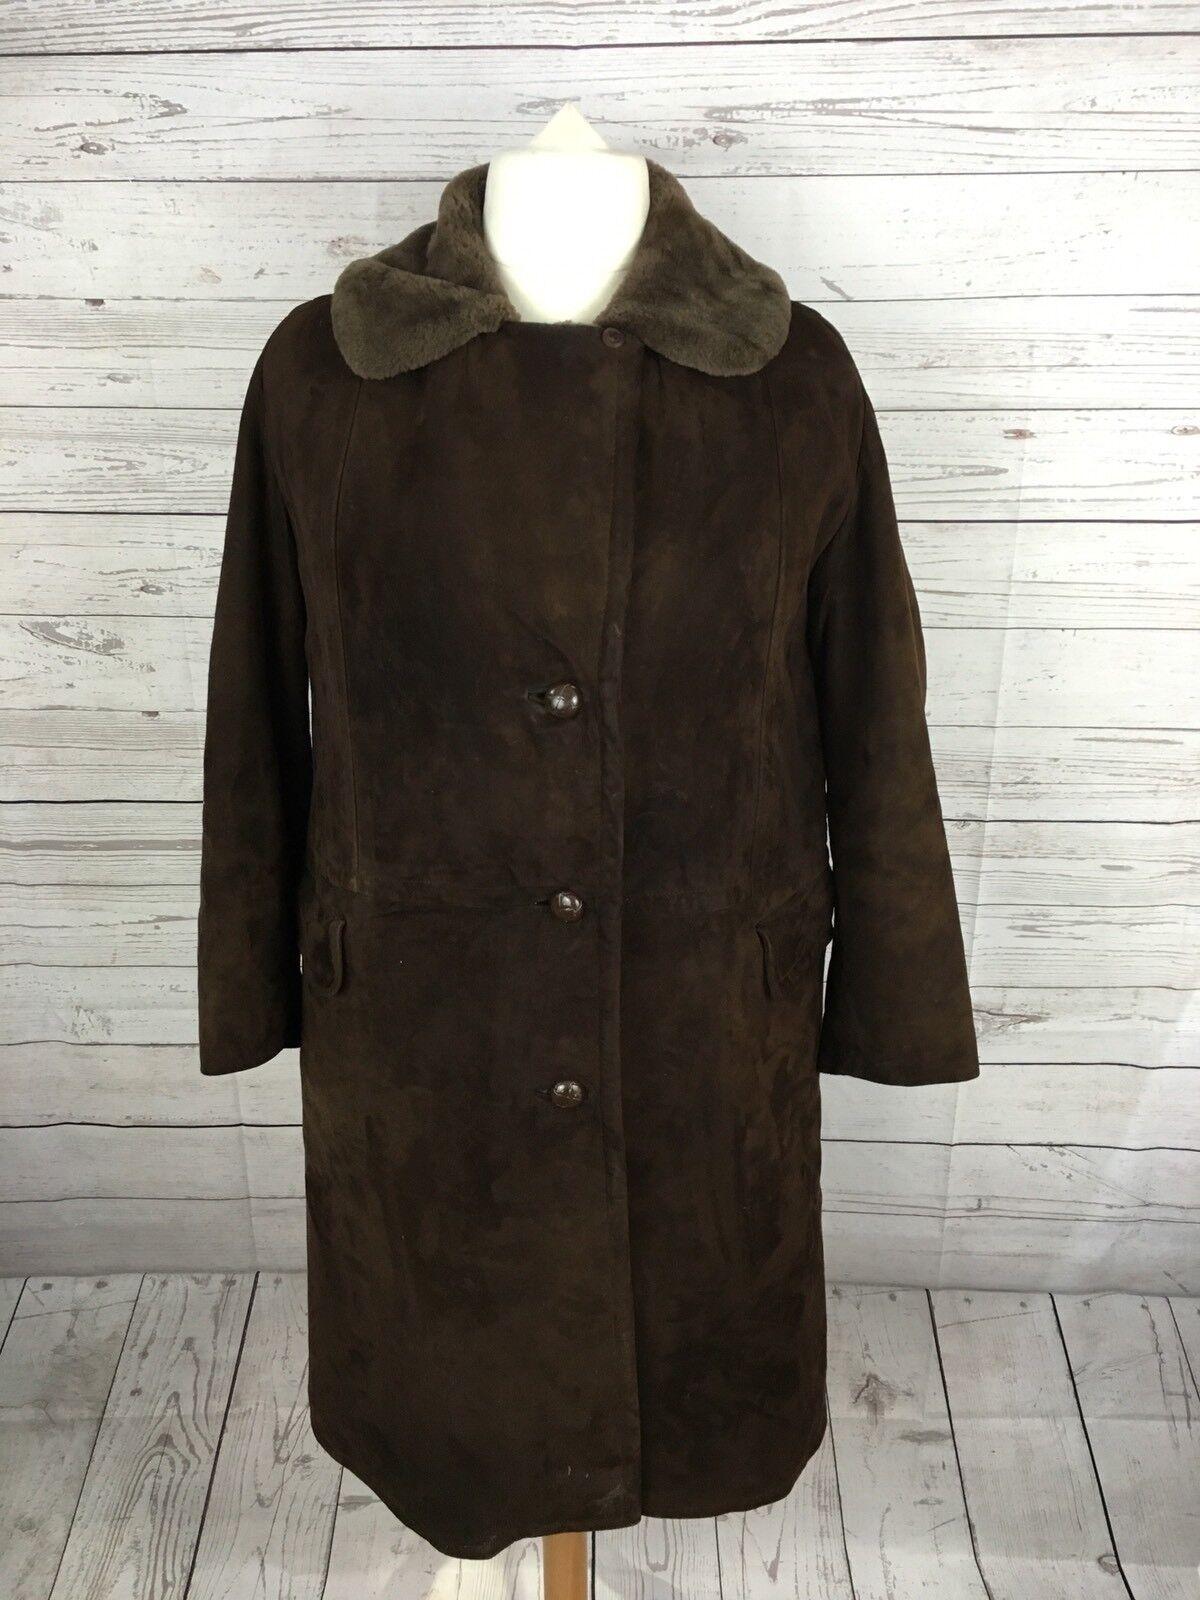 Womens Sheepskin Coat - UK16 - Brown - Great Condition